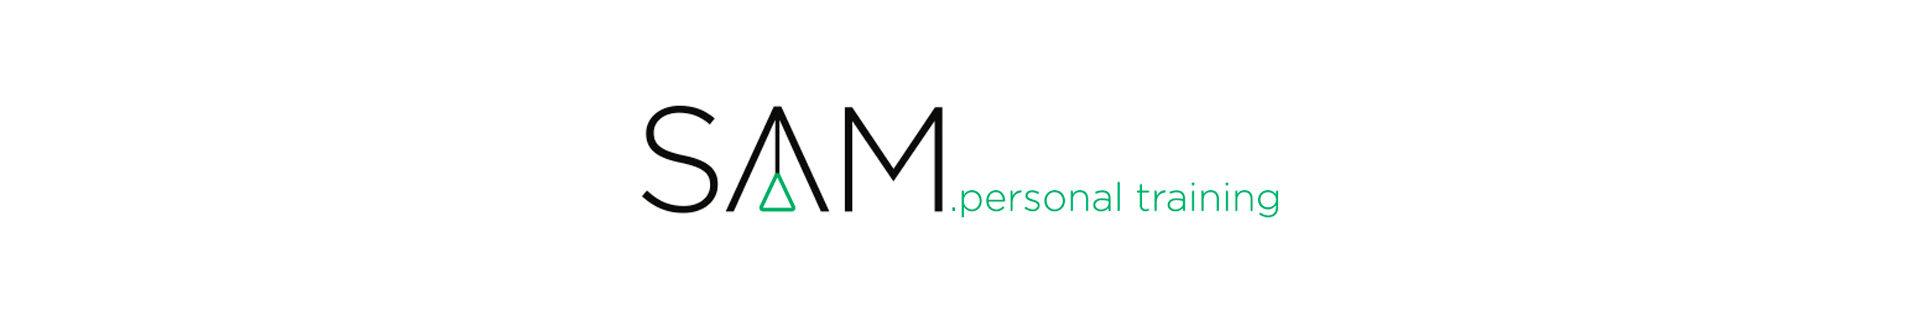 Personal Trainer Sam